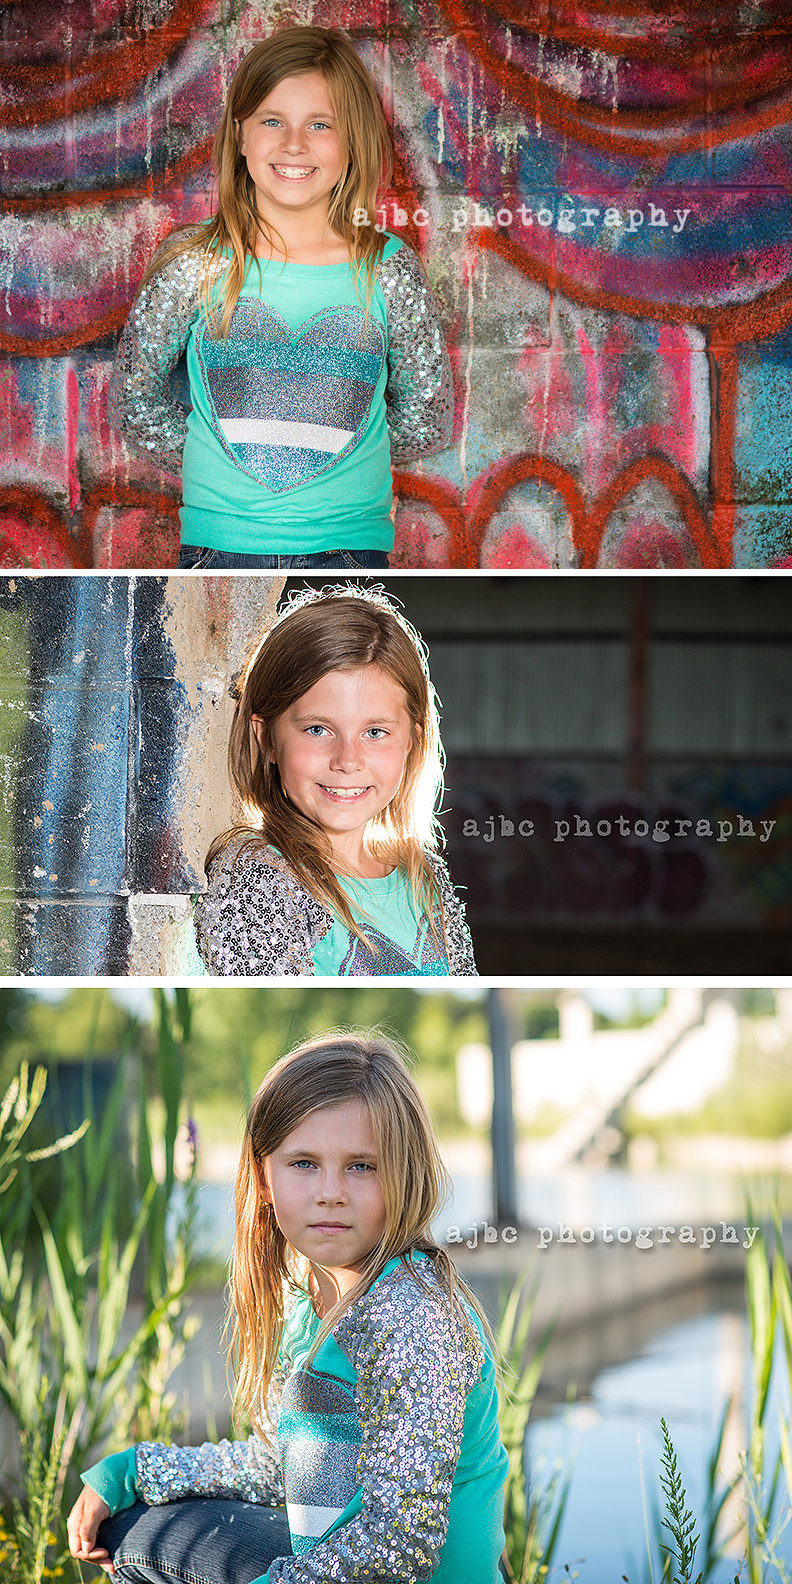 AJBC Photography girl Port Huron Michigan Photographer graffiti creative portraits